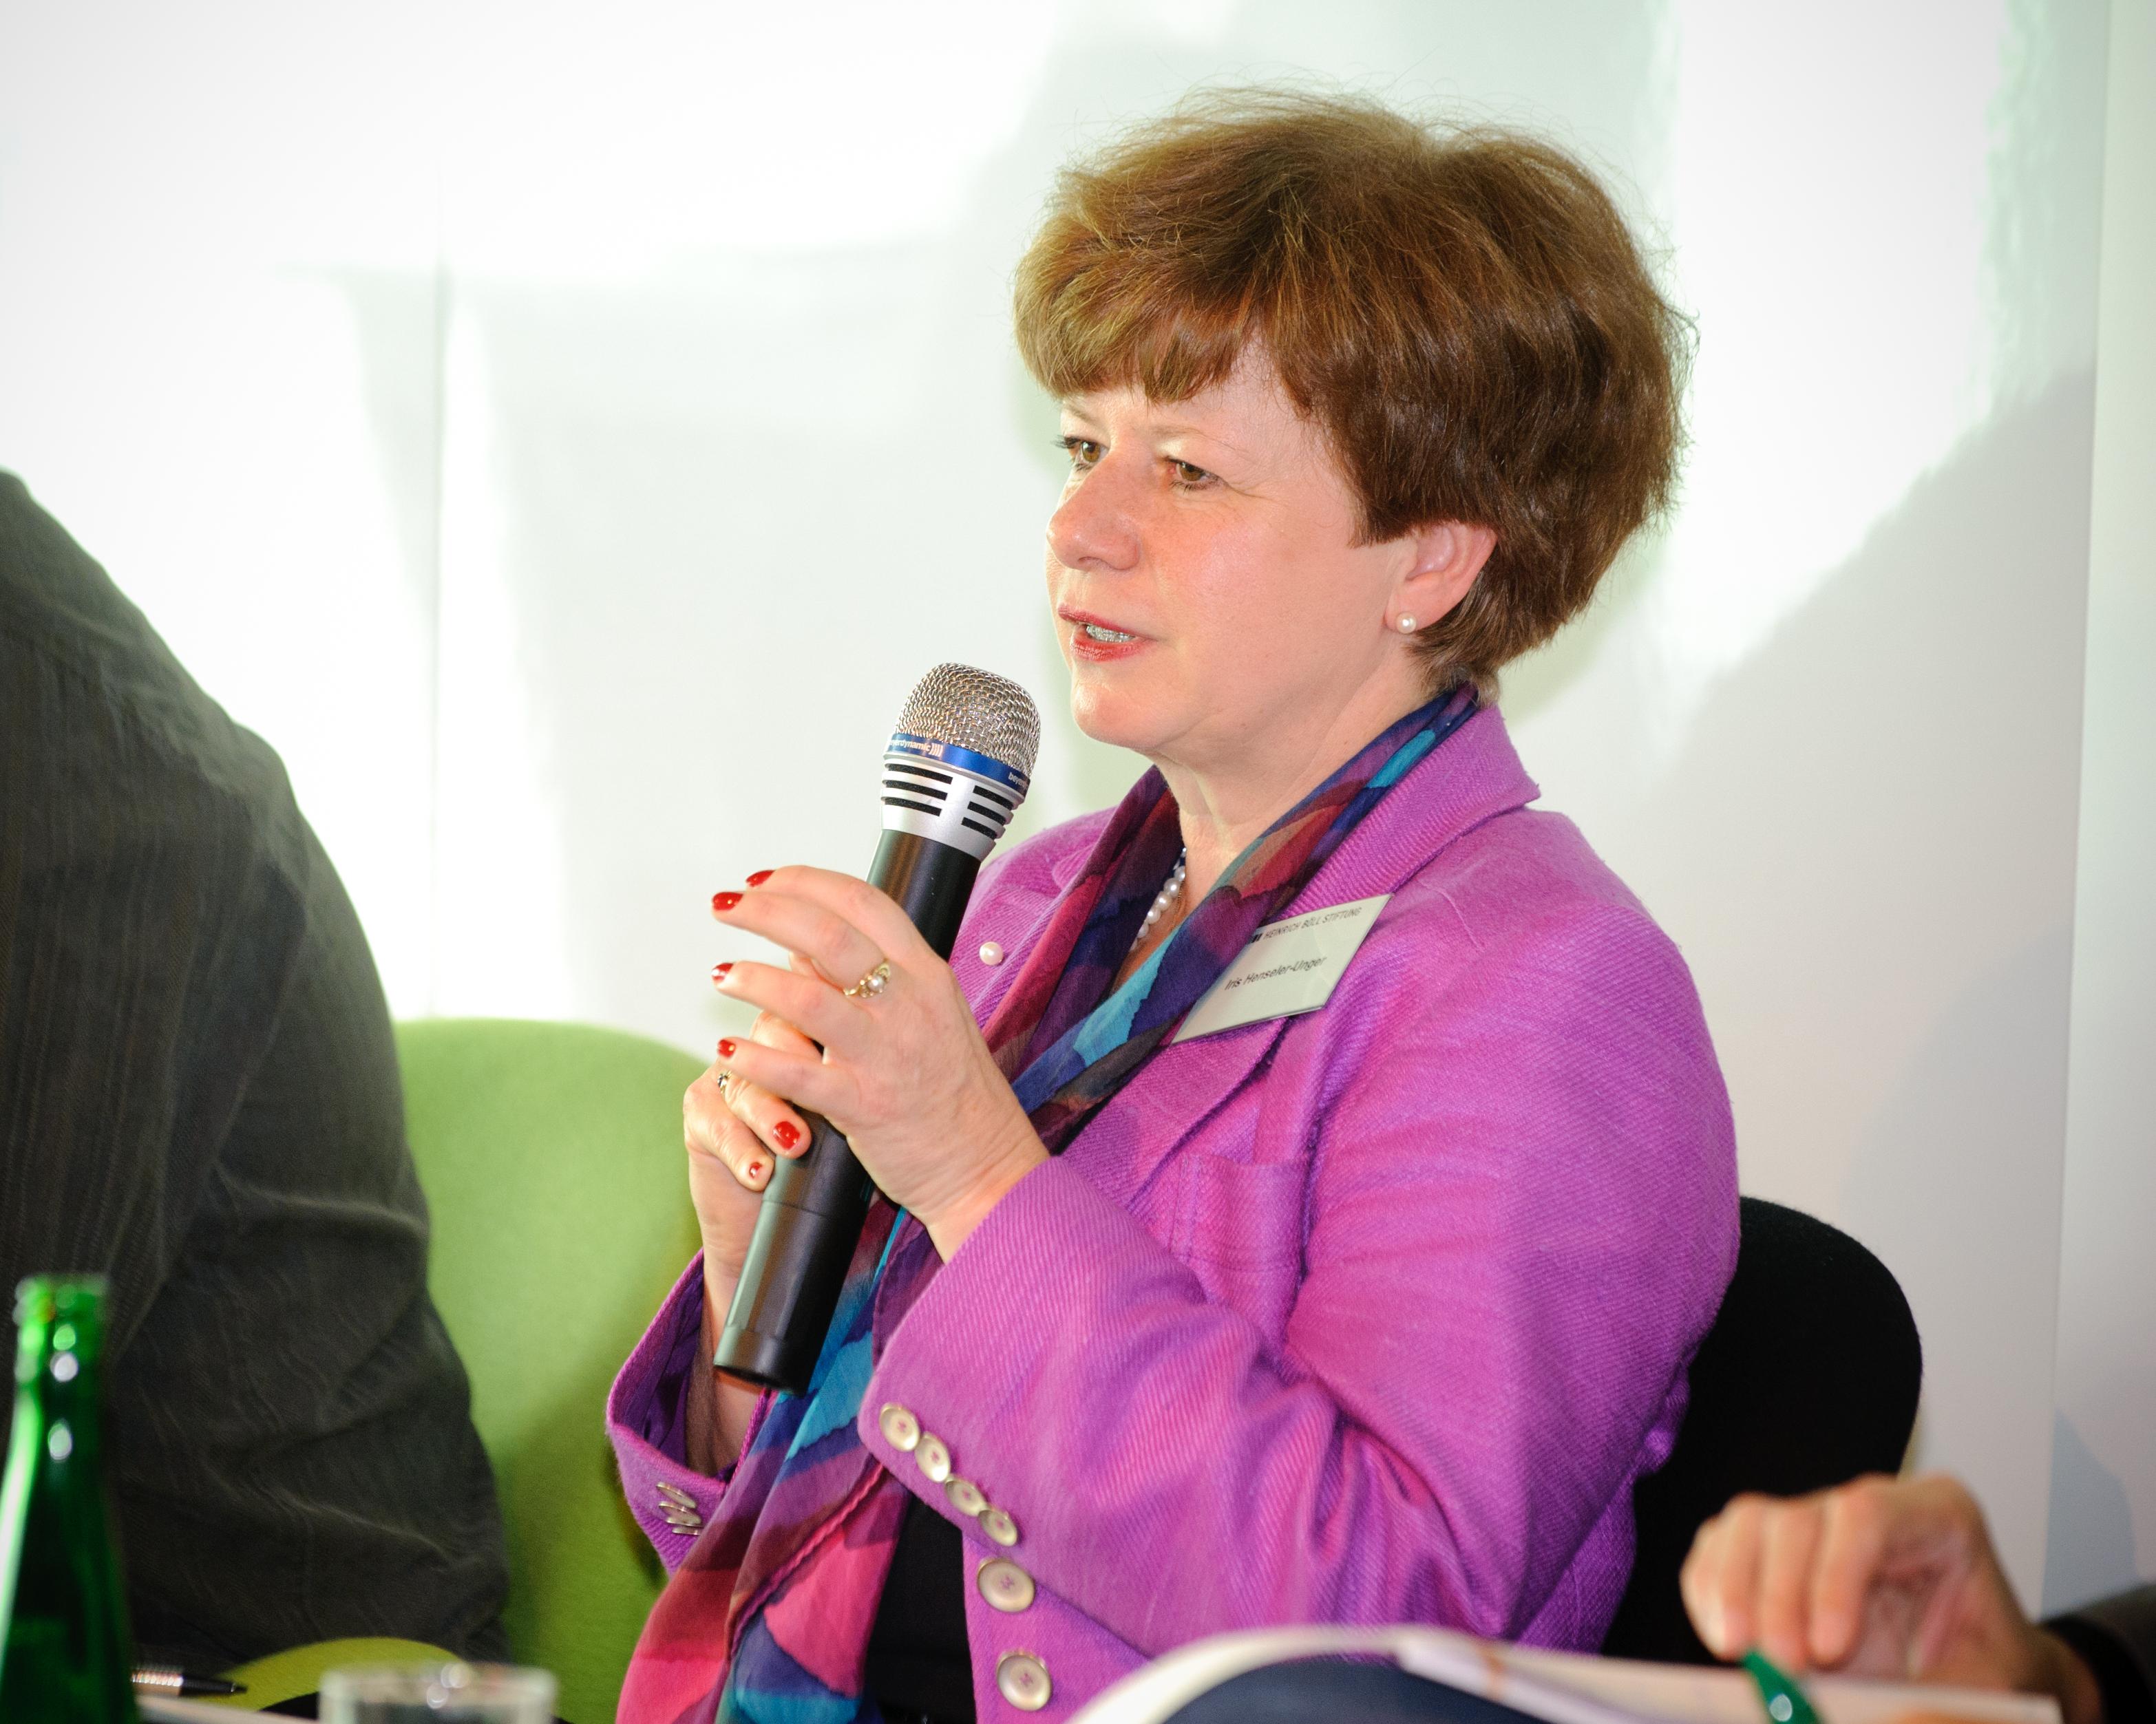 Ehemalige Vizepräsidentin der Bundesnetzagentur: Iris Henseler-Unger. Bild: Stephan Röhl. Lizenz: Creative Commons BY-SA.